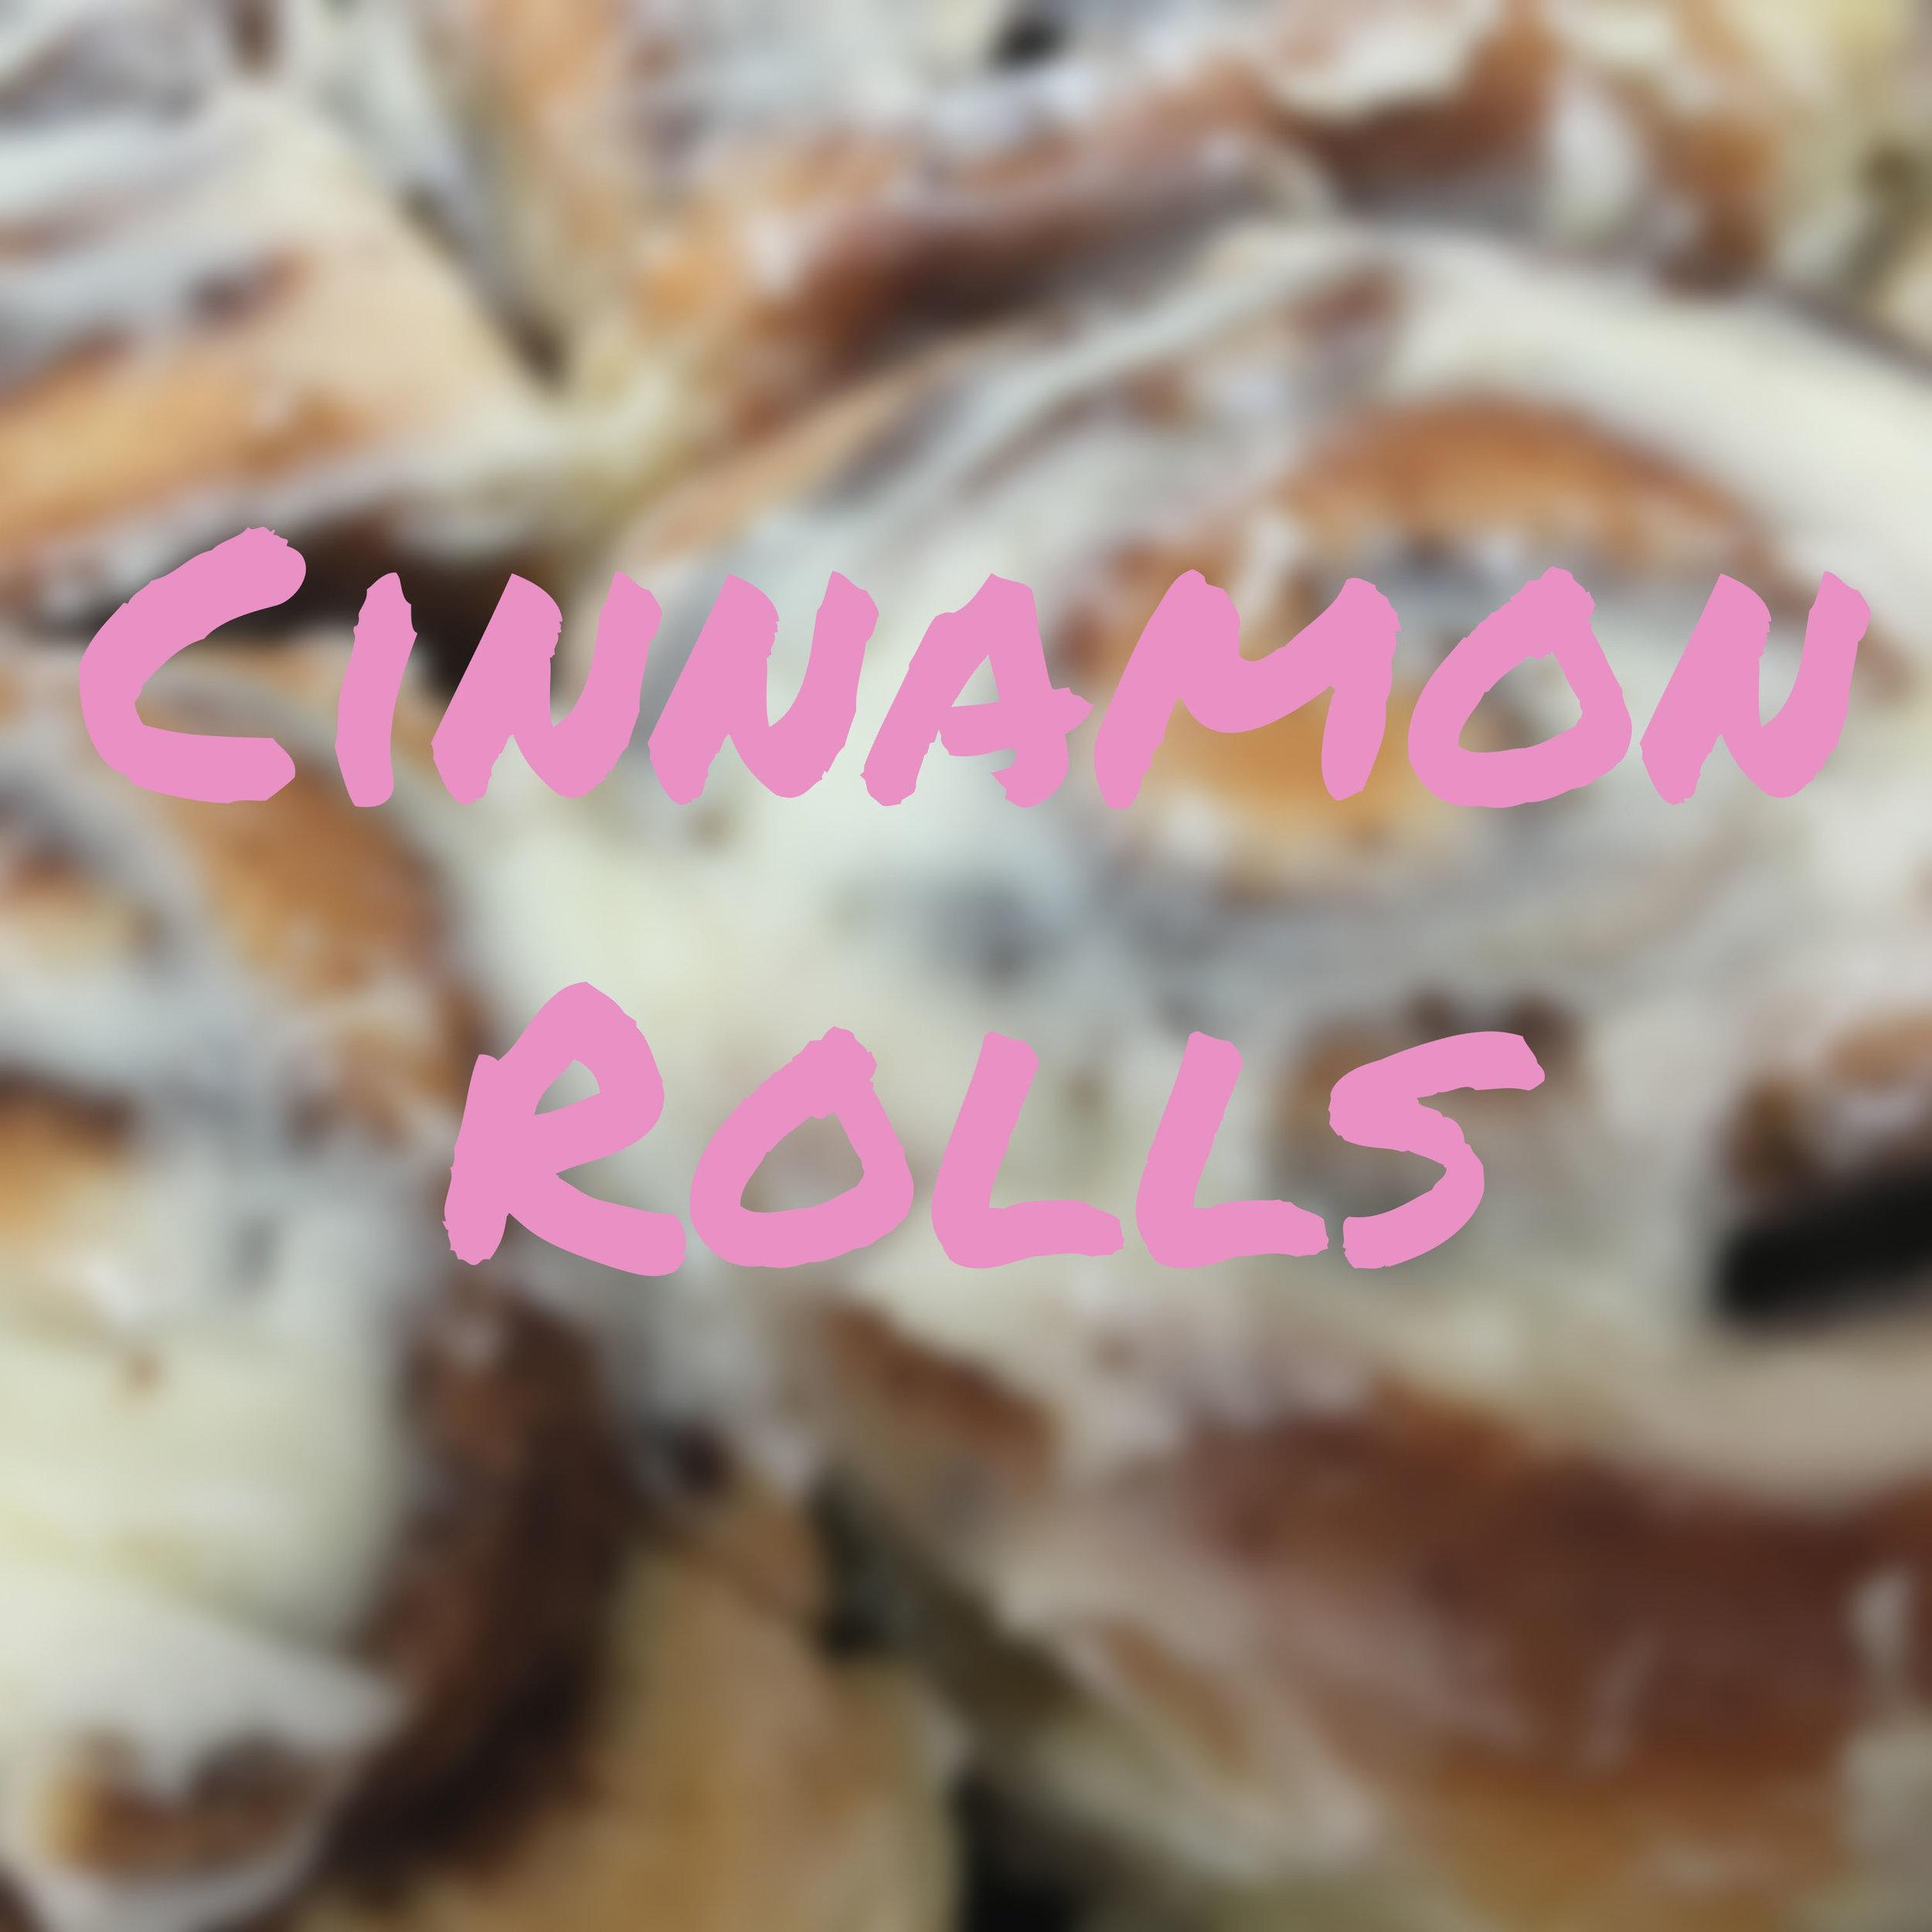 Cinnamon Rolls Section